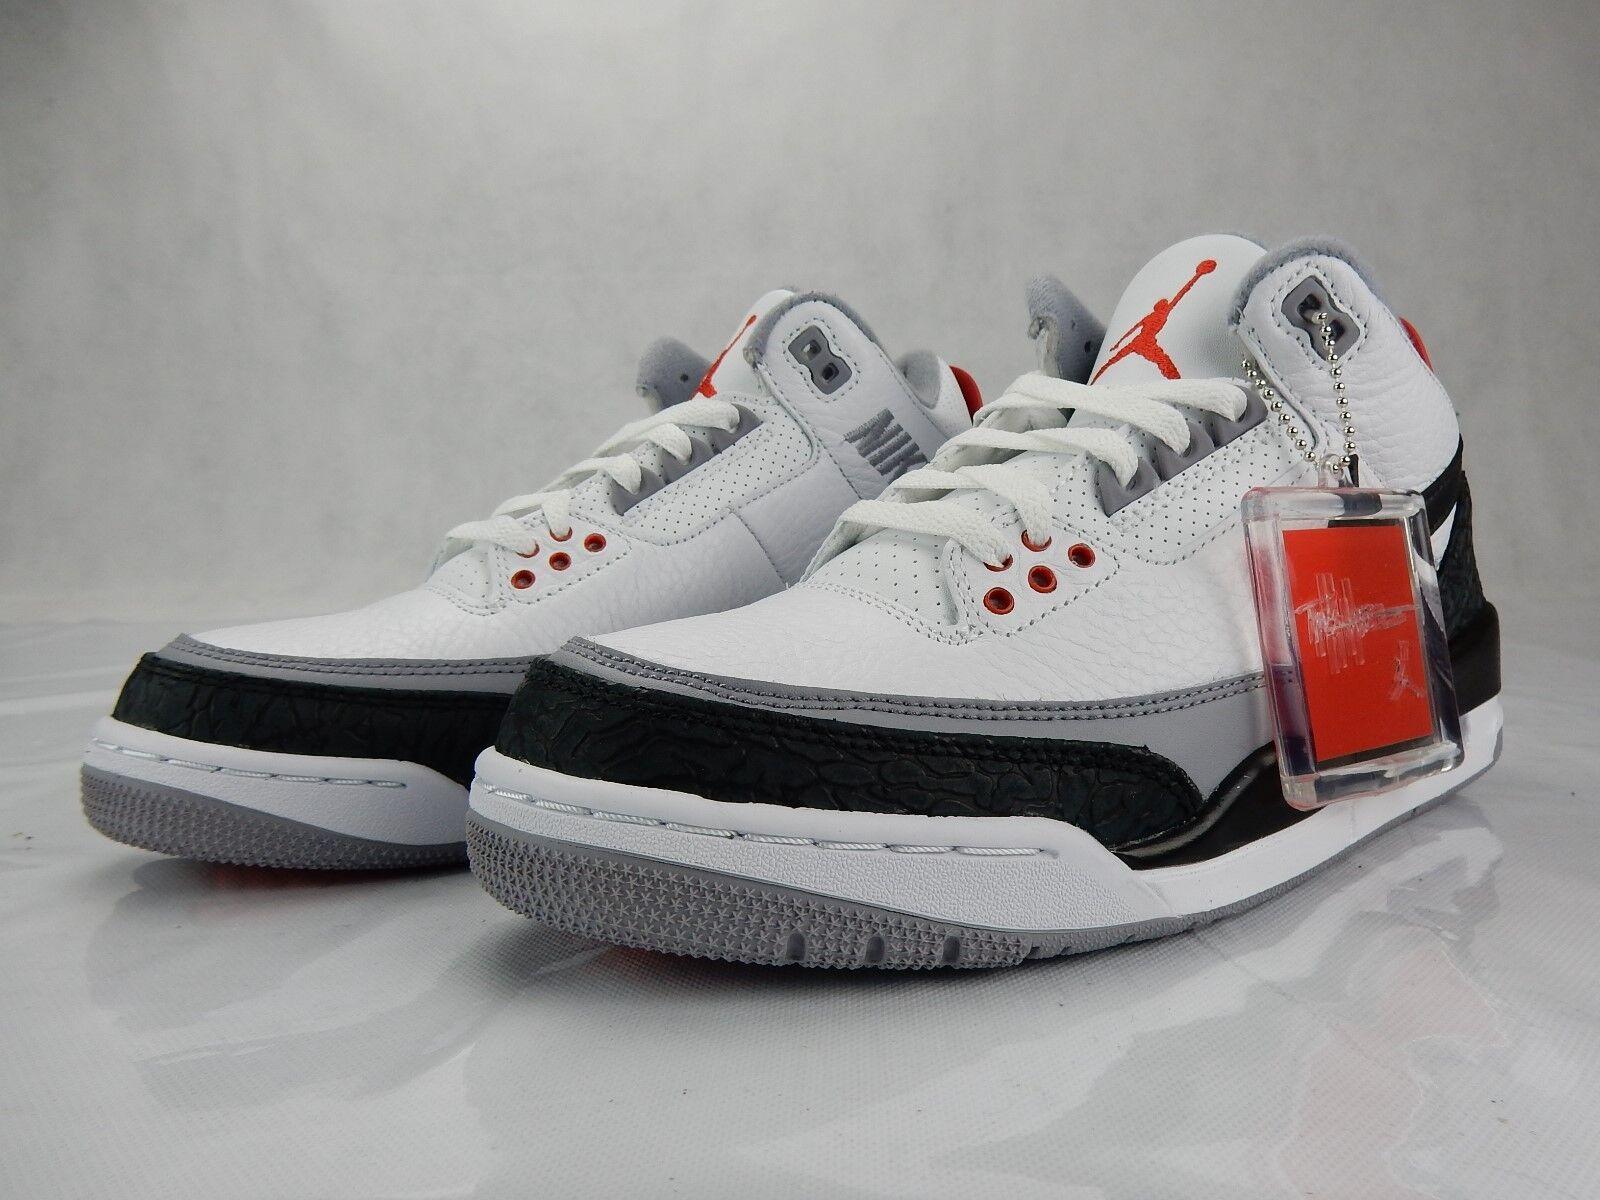 Nike air jordan 3 iii retrò tinker 8 uomini s aq3835 160 bianco - rosso di scarpe nere